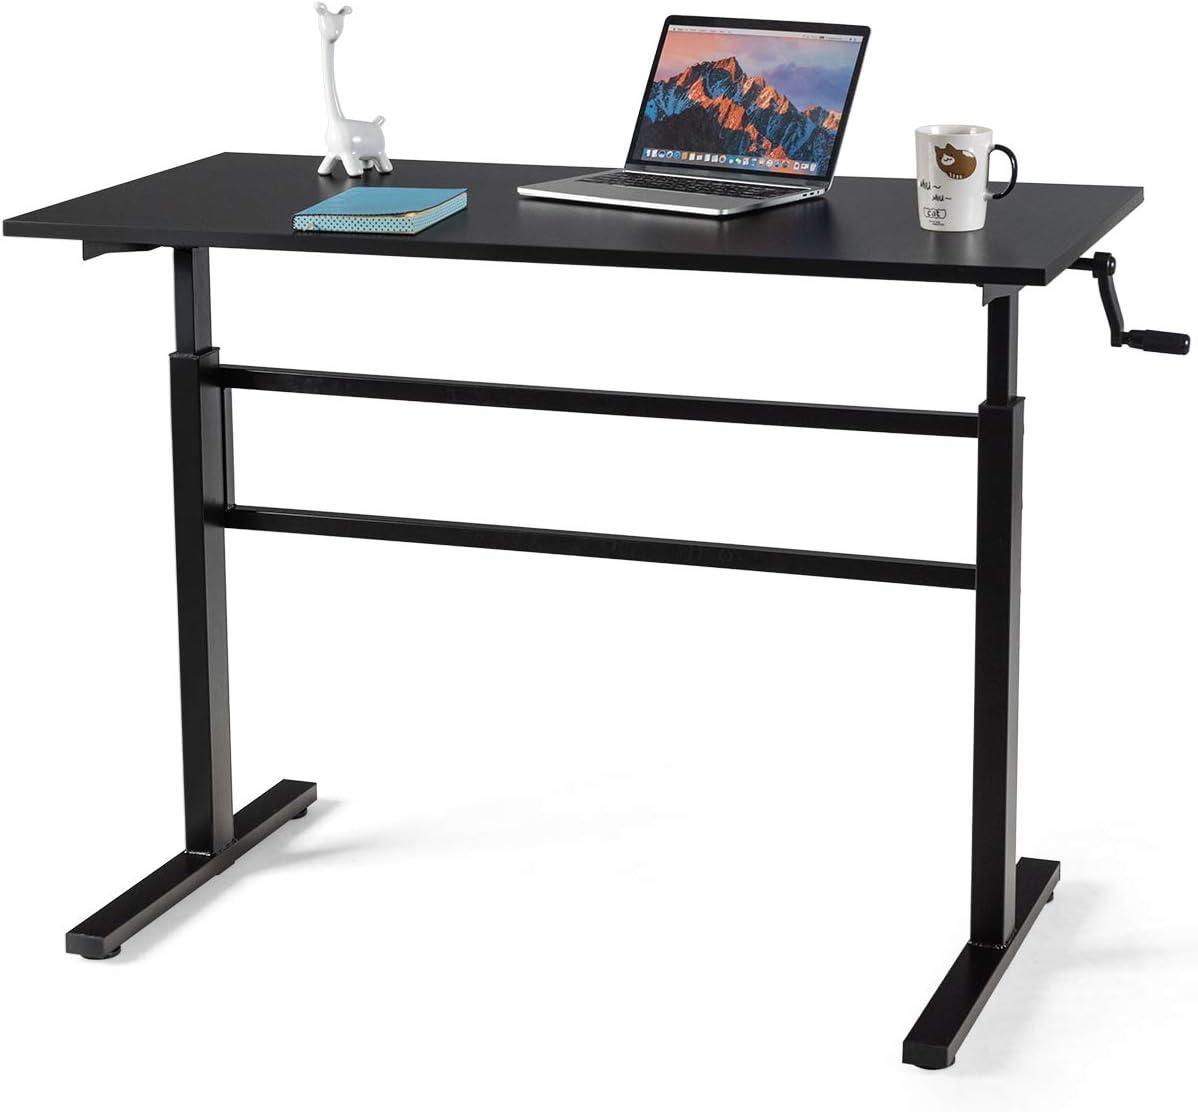 Washington Mall Very popular Tangkula Standing Desk Height Adjustable Computer Stand Sit to